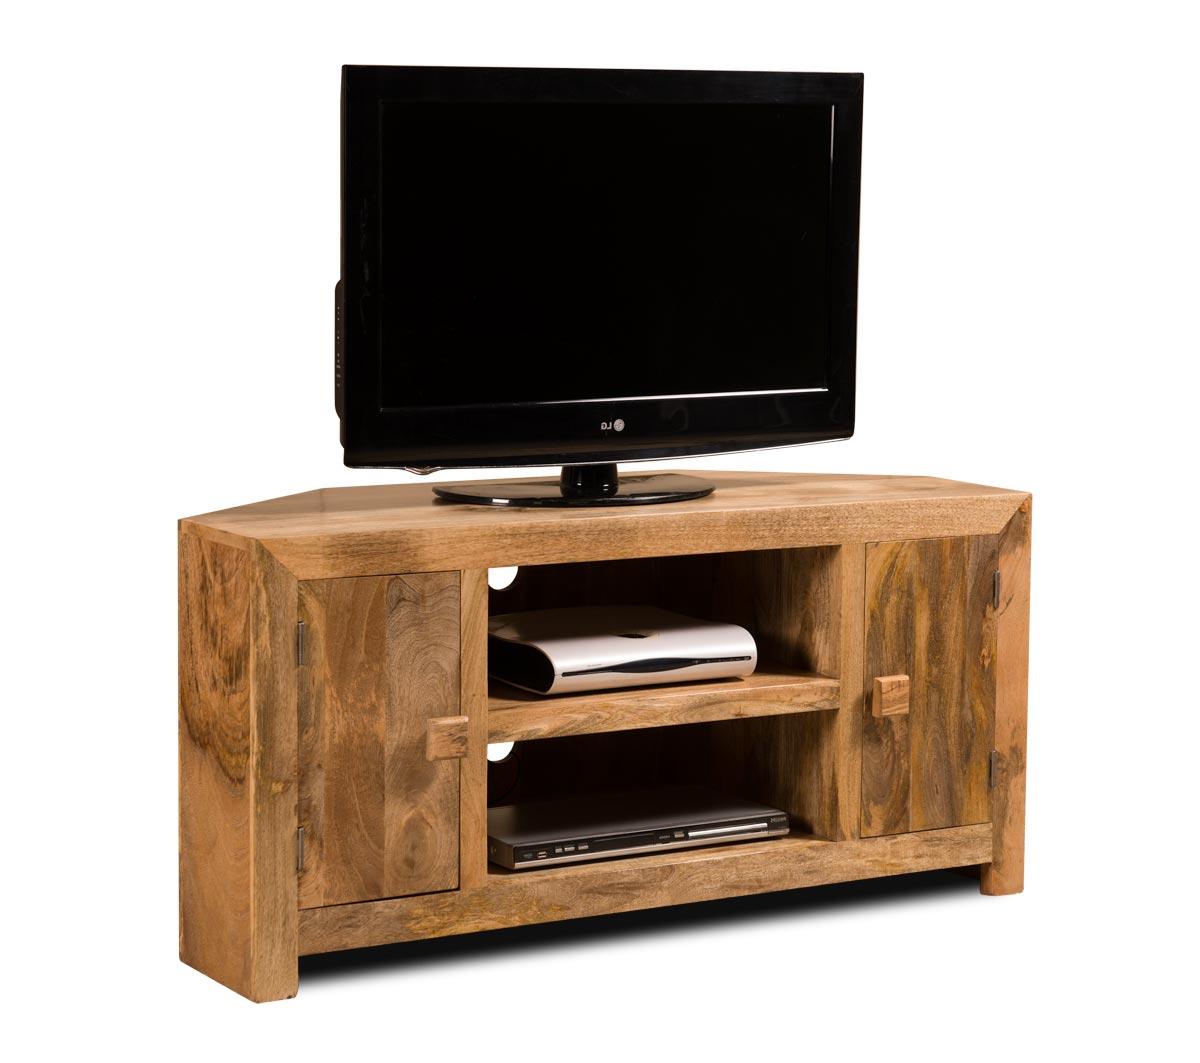 Dakota Light Mango Corner Tv Unit Cabinet Shelves Solid Wood Indian Pertaining To Most Current Solid Wood Corner Tv Cabinets (View 5 of 20)